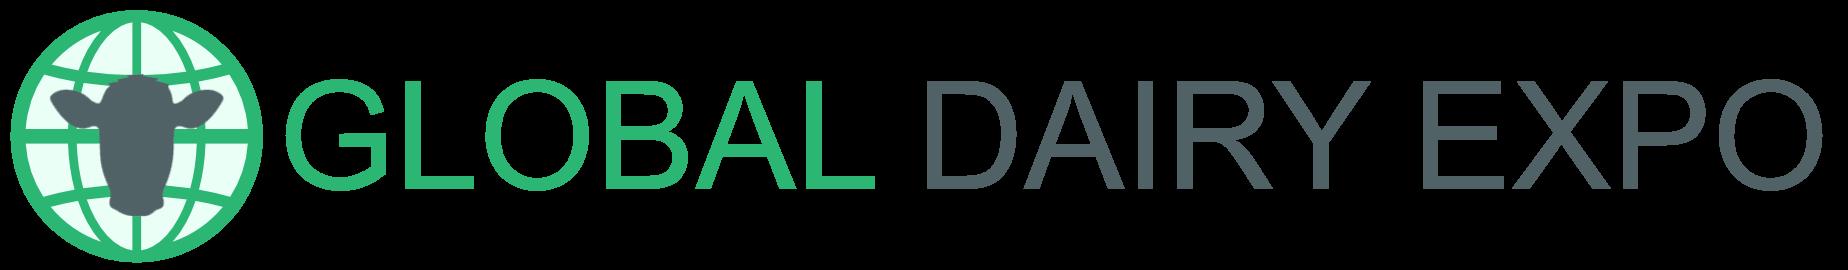 global expo dairy logo 3